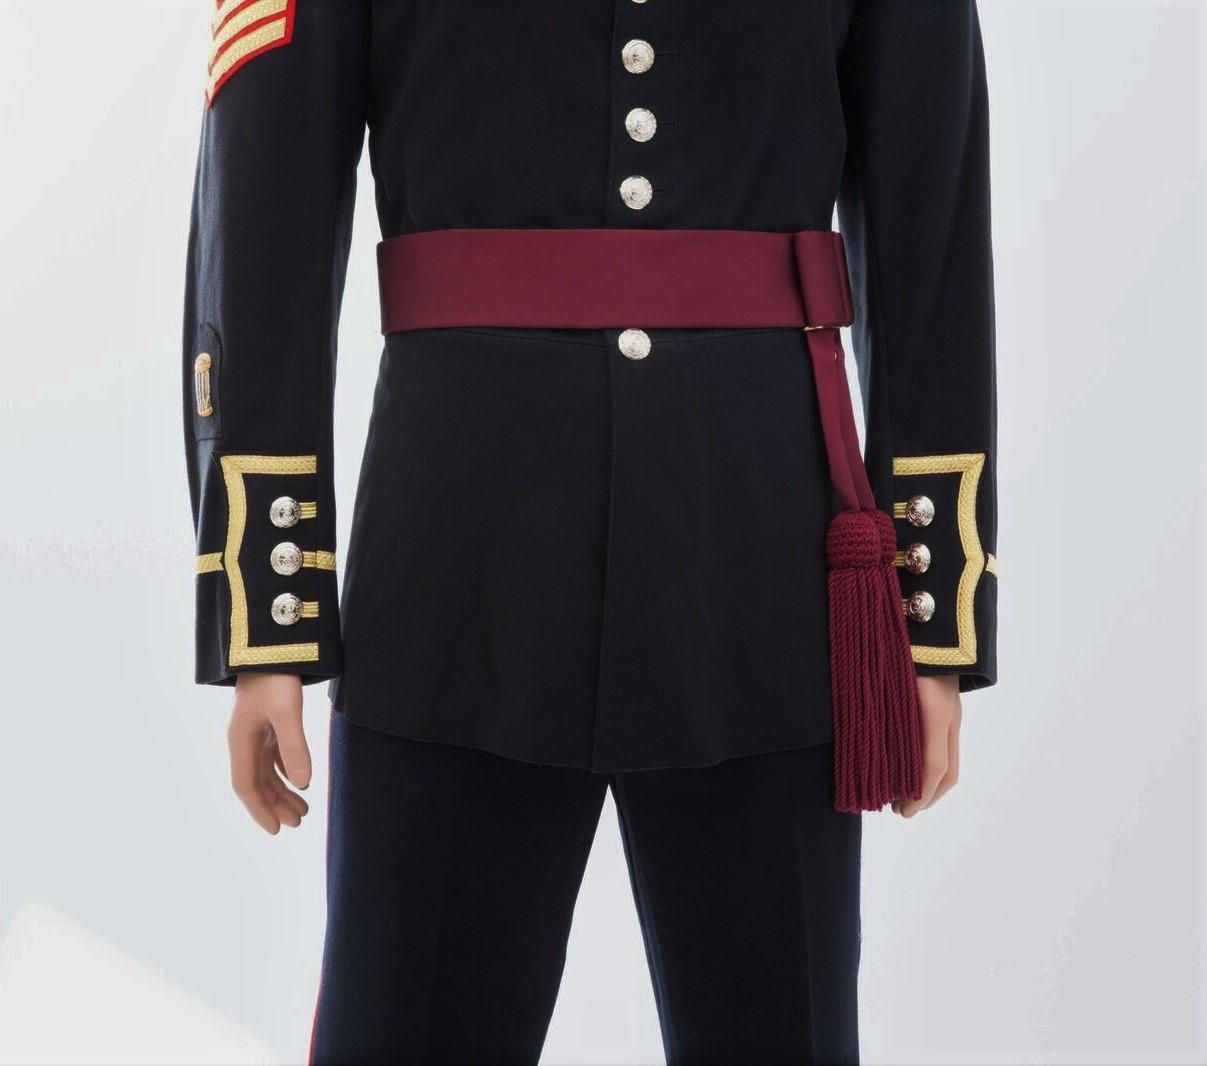 Director of Music's/Officers 'Crimson Waist Sash'